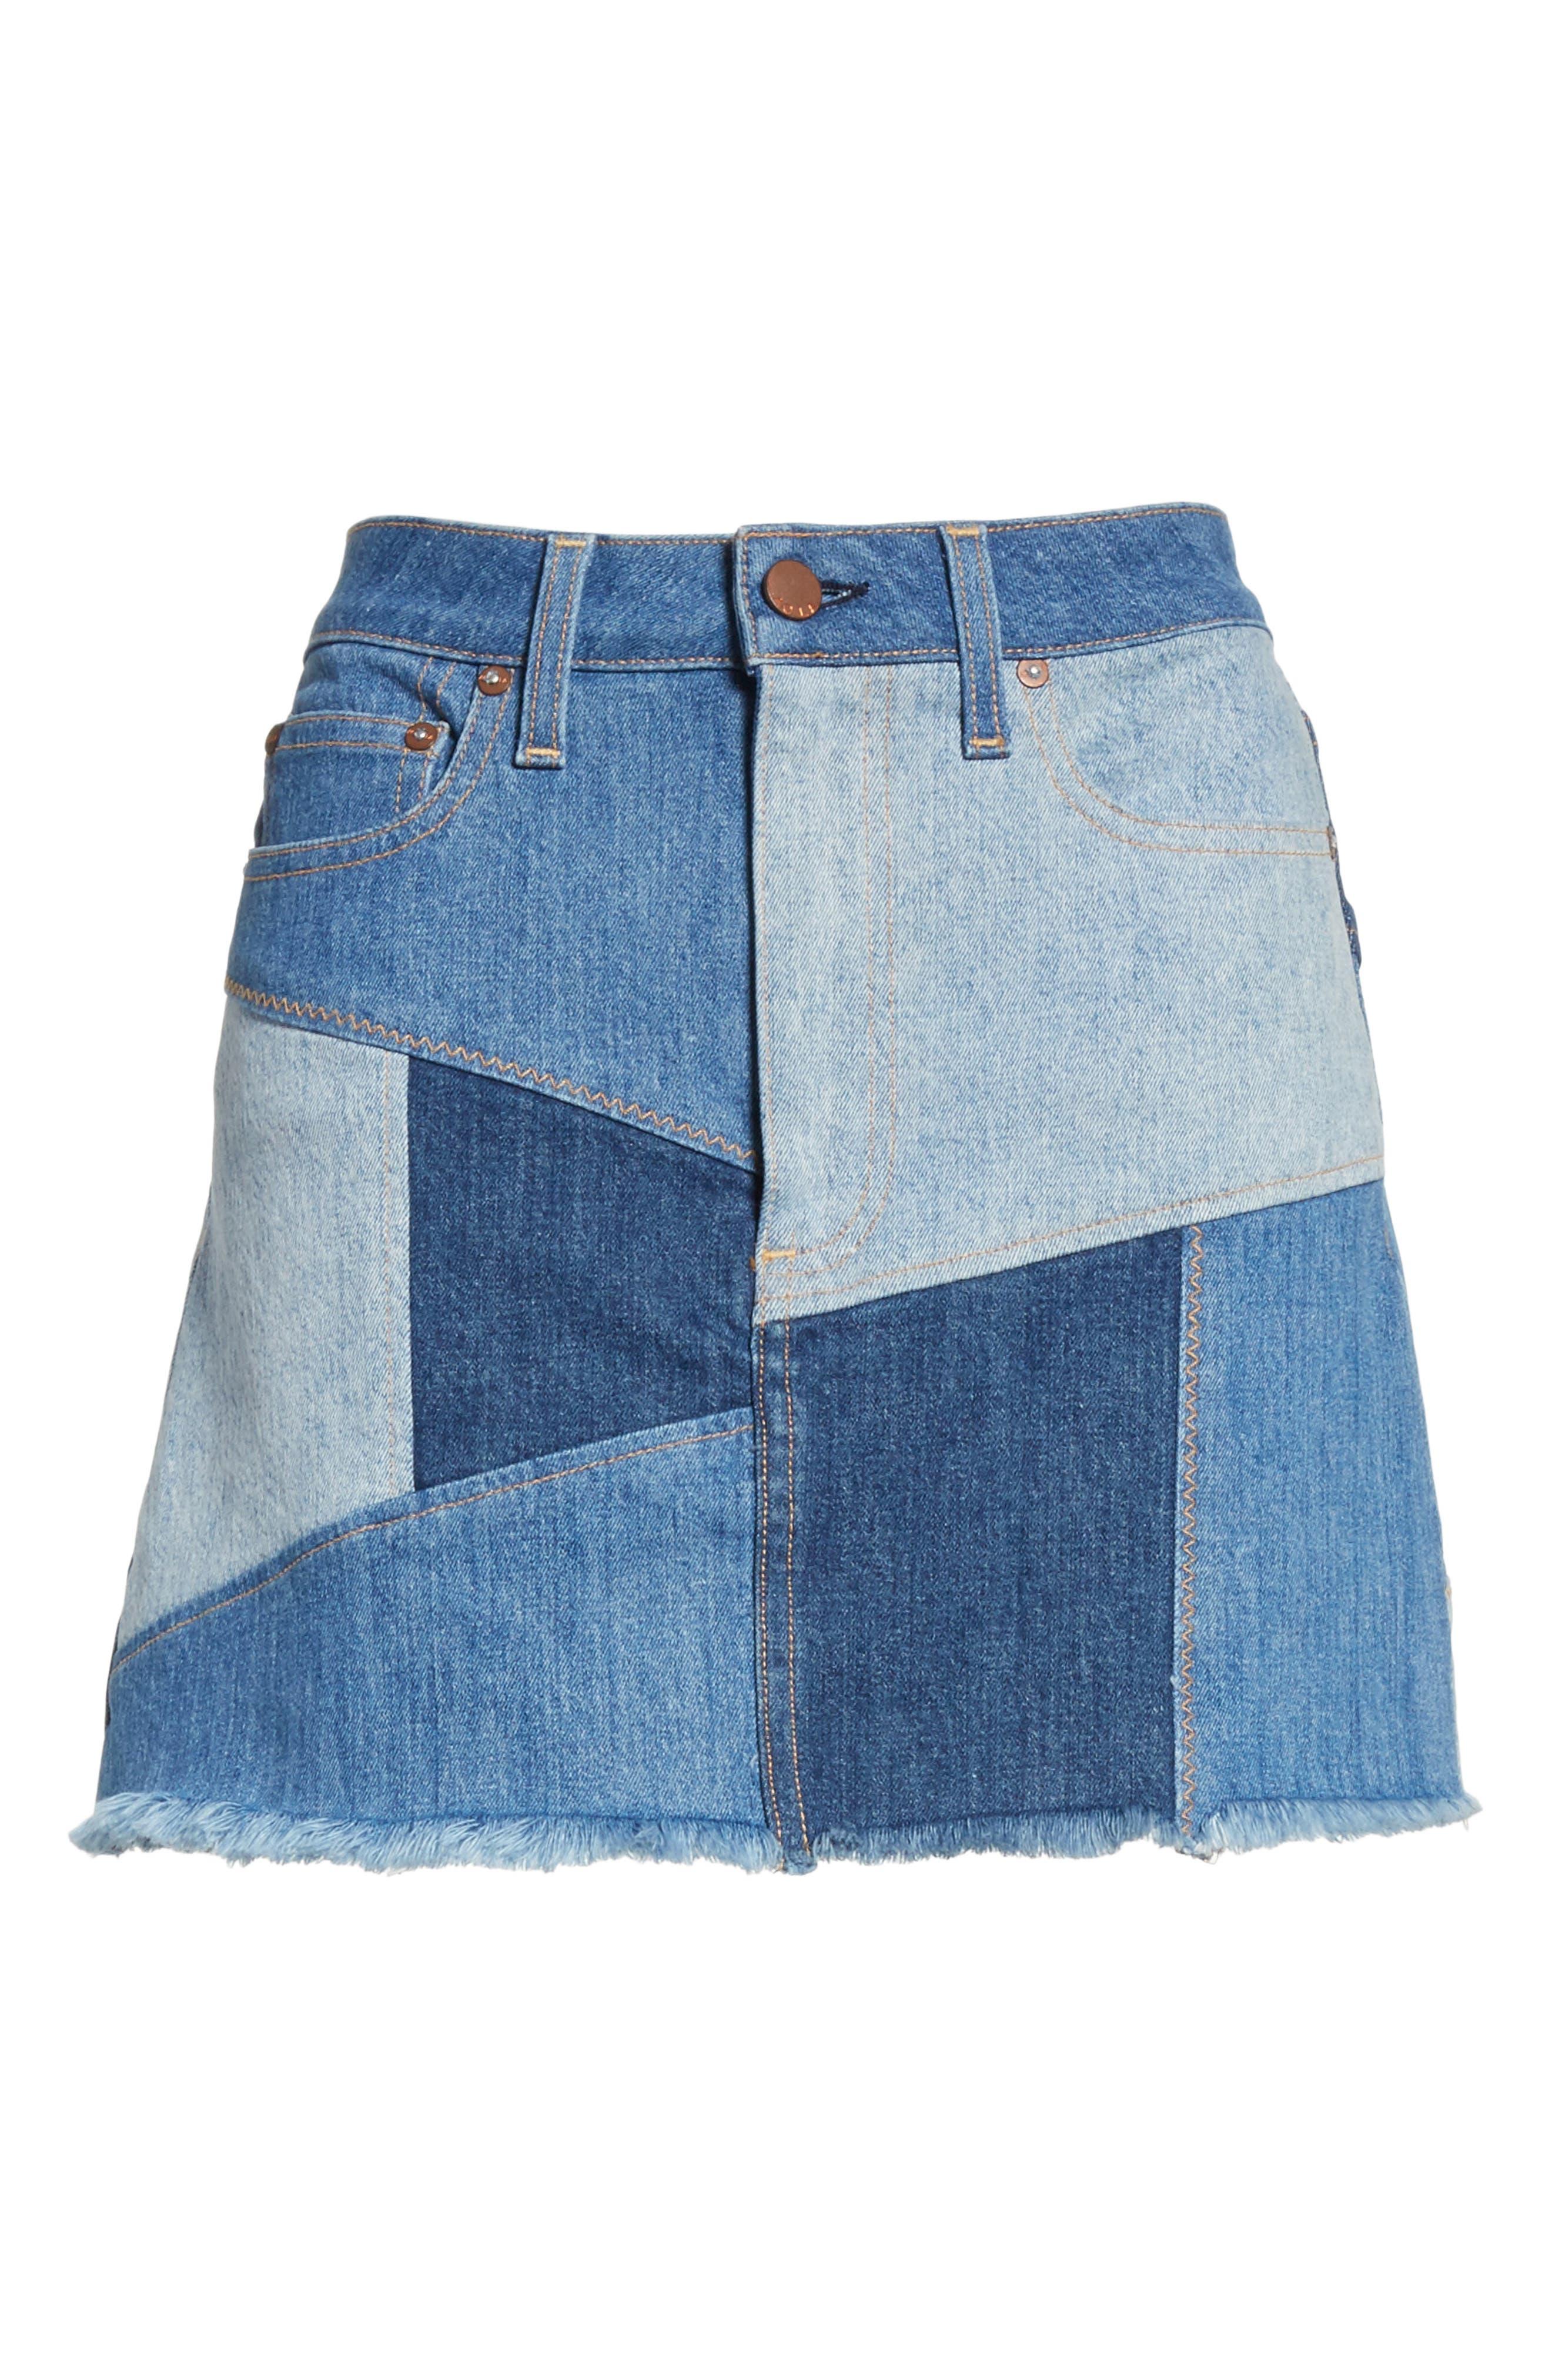 AO.LA Patchwork Denim Miniskirt,                             Alternate thumbnail 6, color,                             485